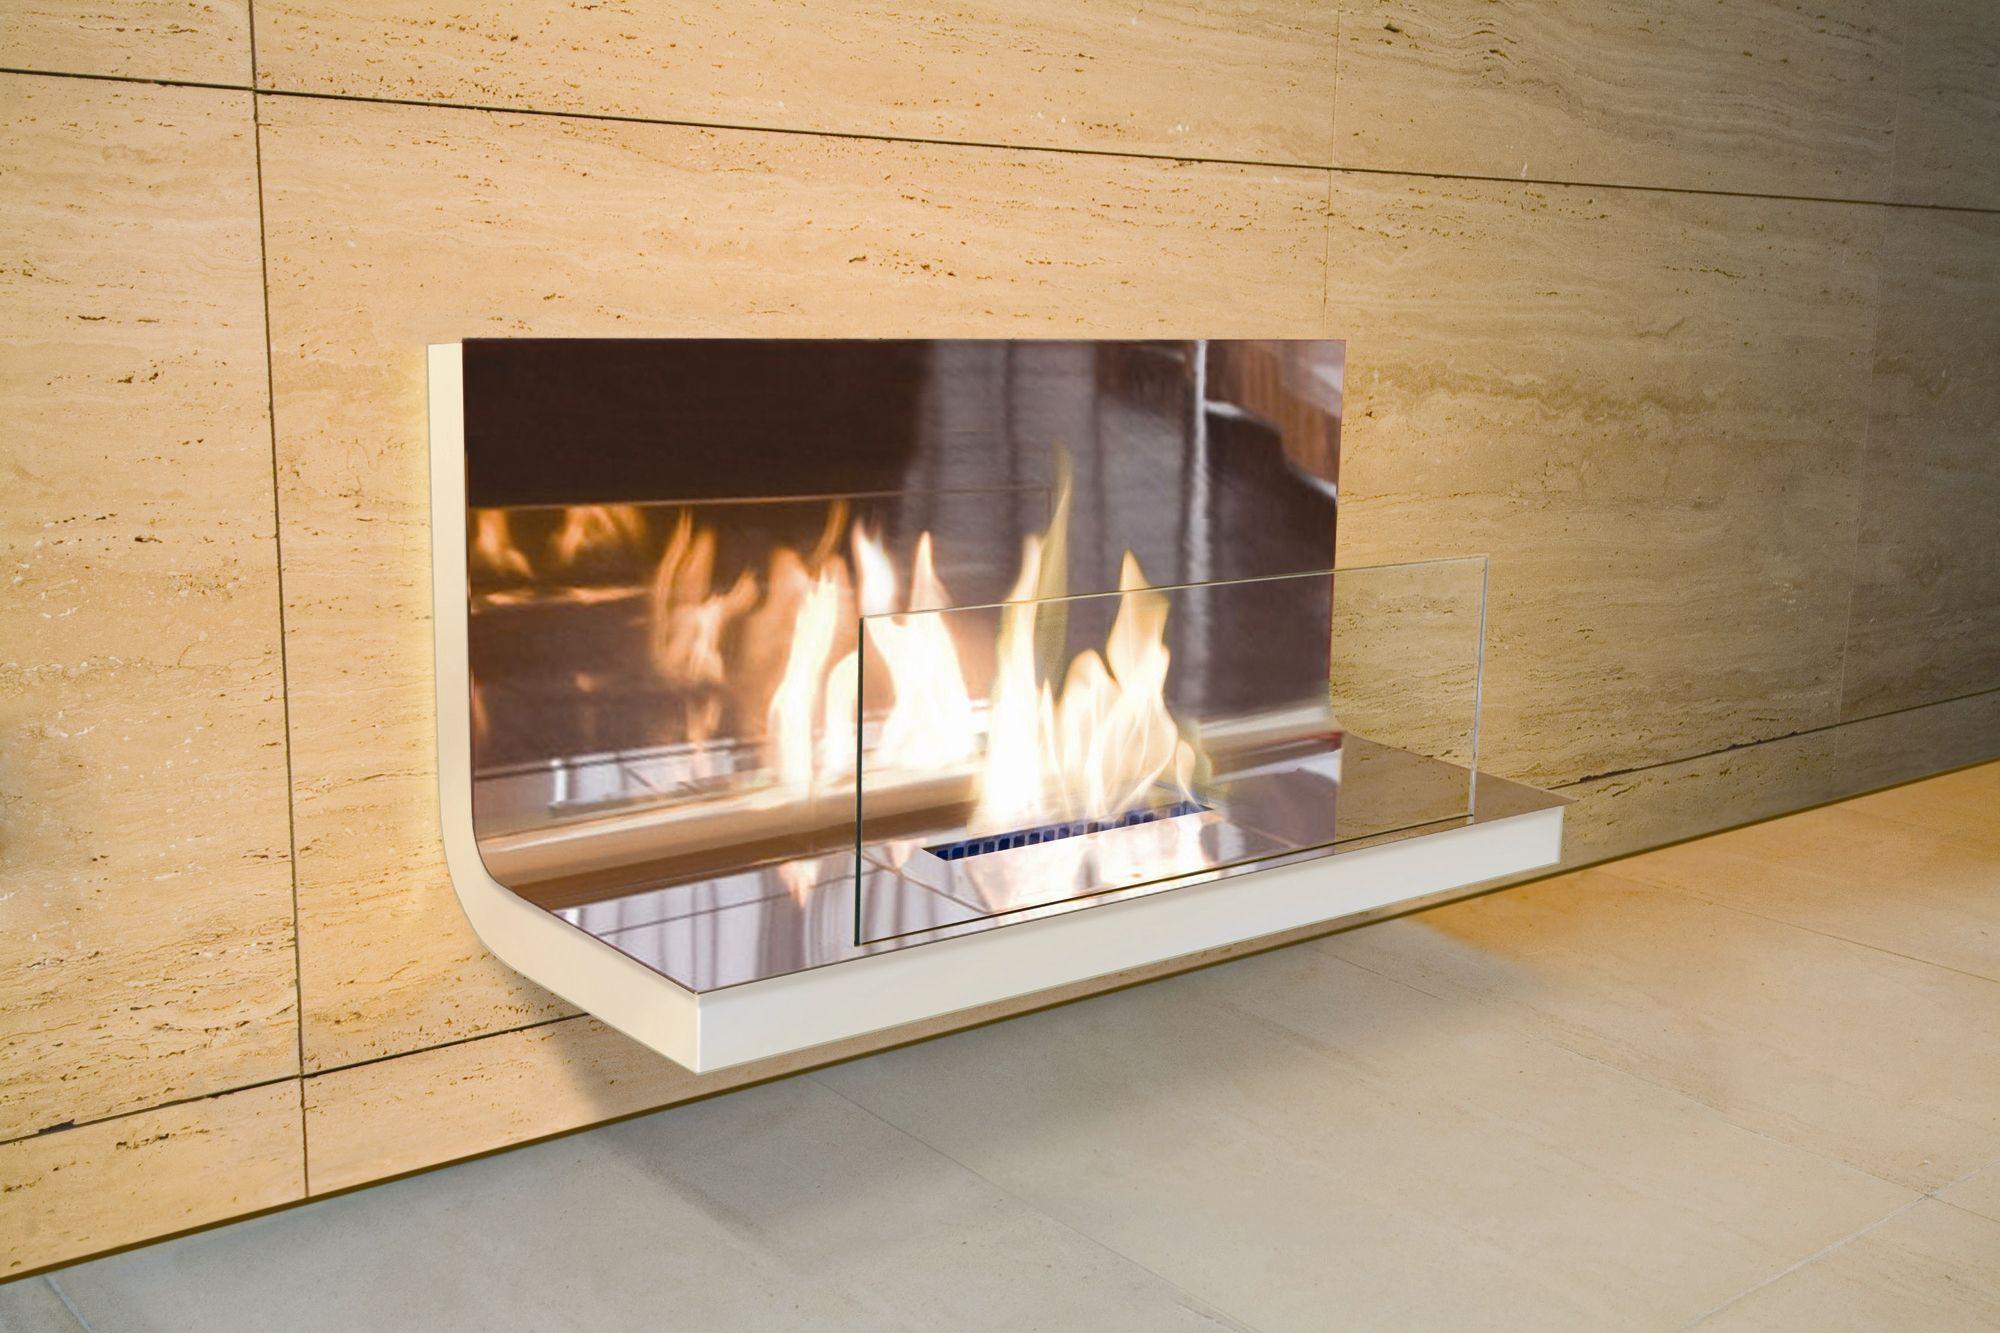 Lauderhill Wall Mounted Electric Fireplace Ethanol Fireplace